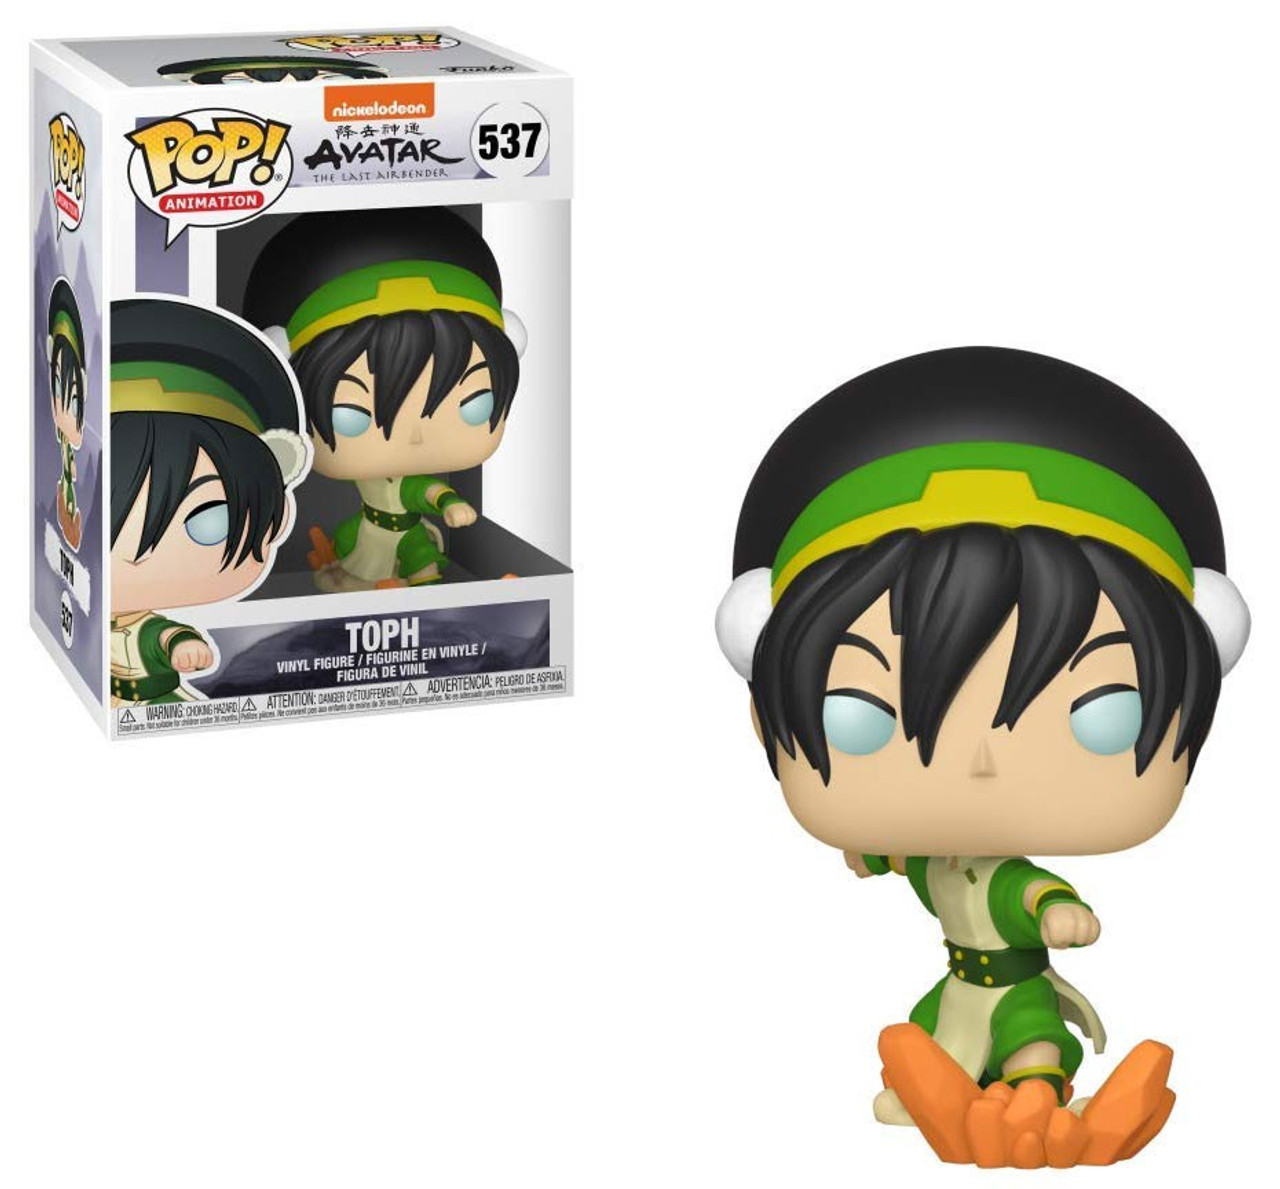 Avatar Animation Funko Pop Iroh with Tea Toy #539